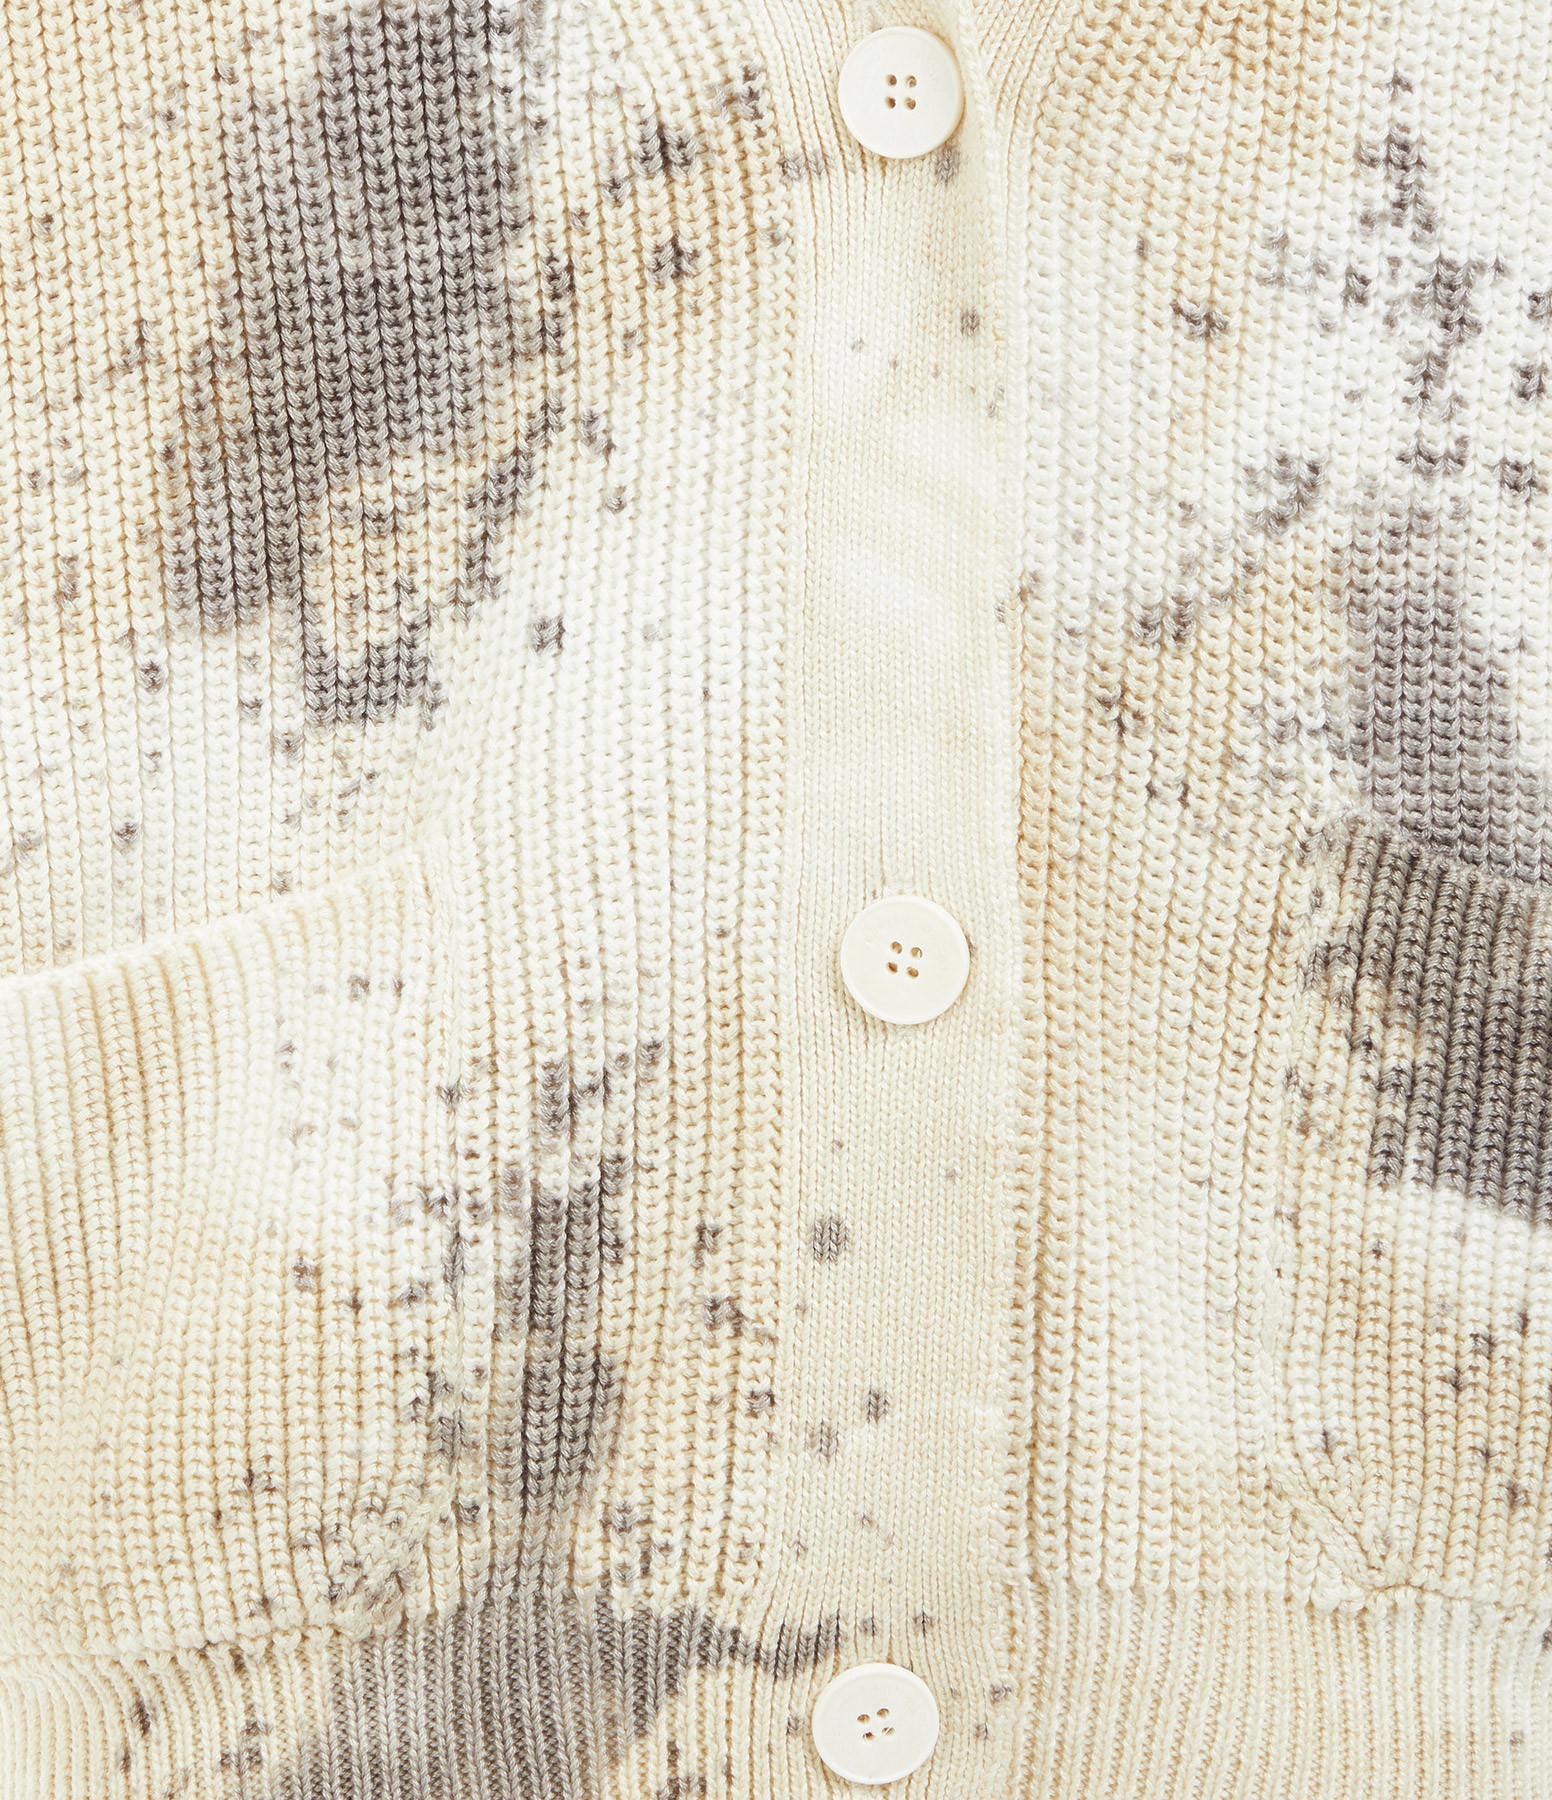 ROBERTO COLLINA - Cardigan Coton Sable